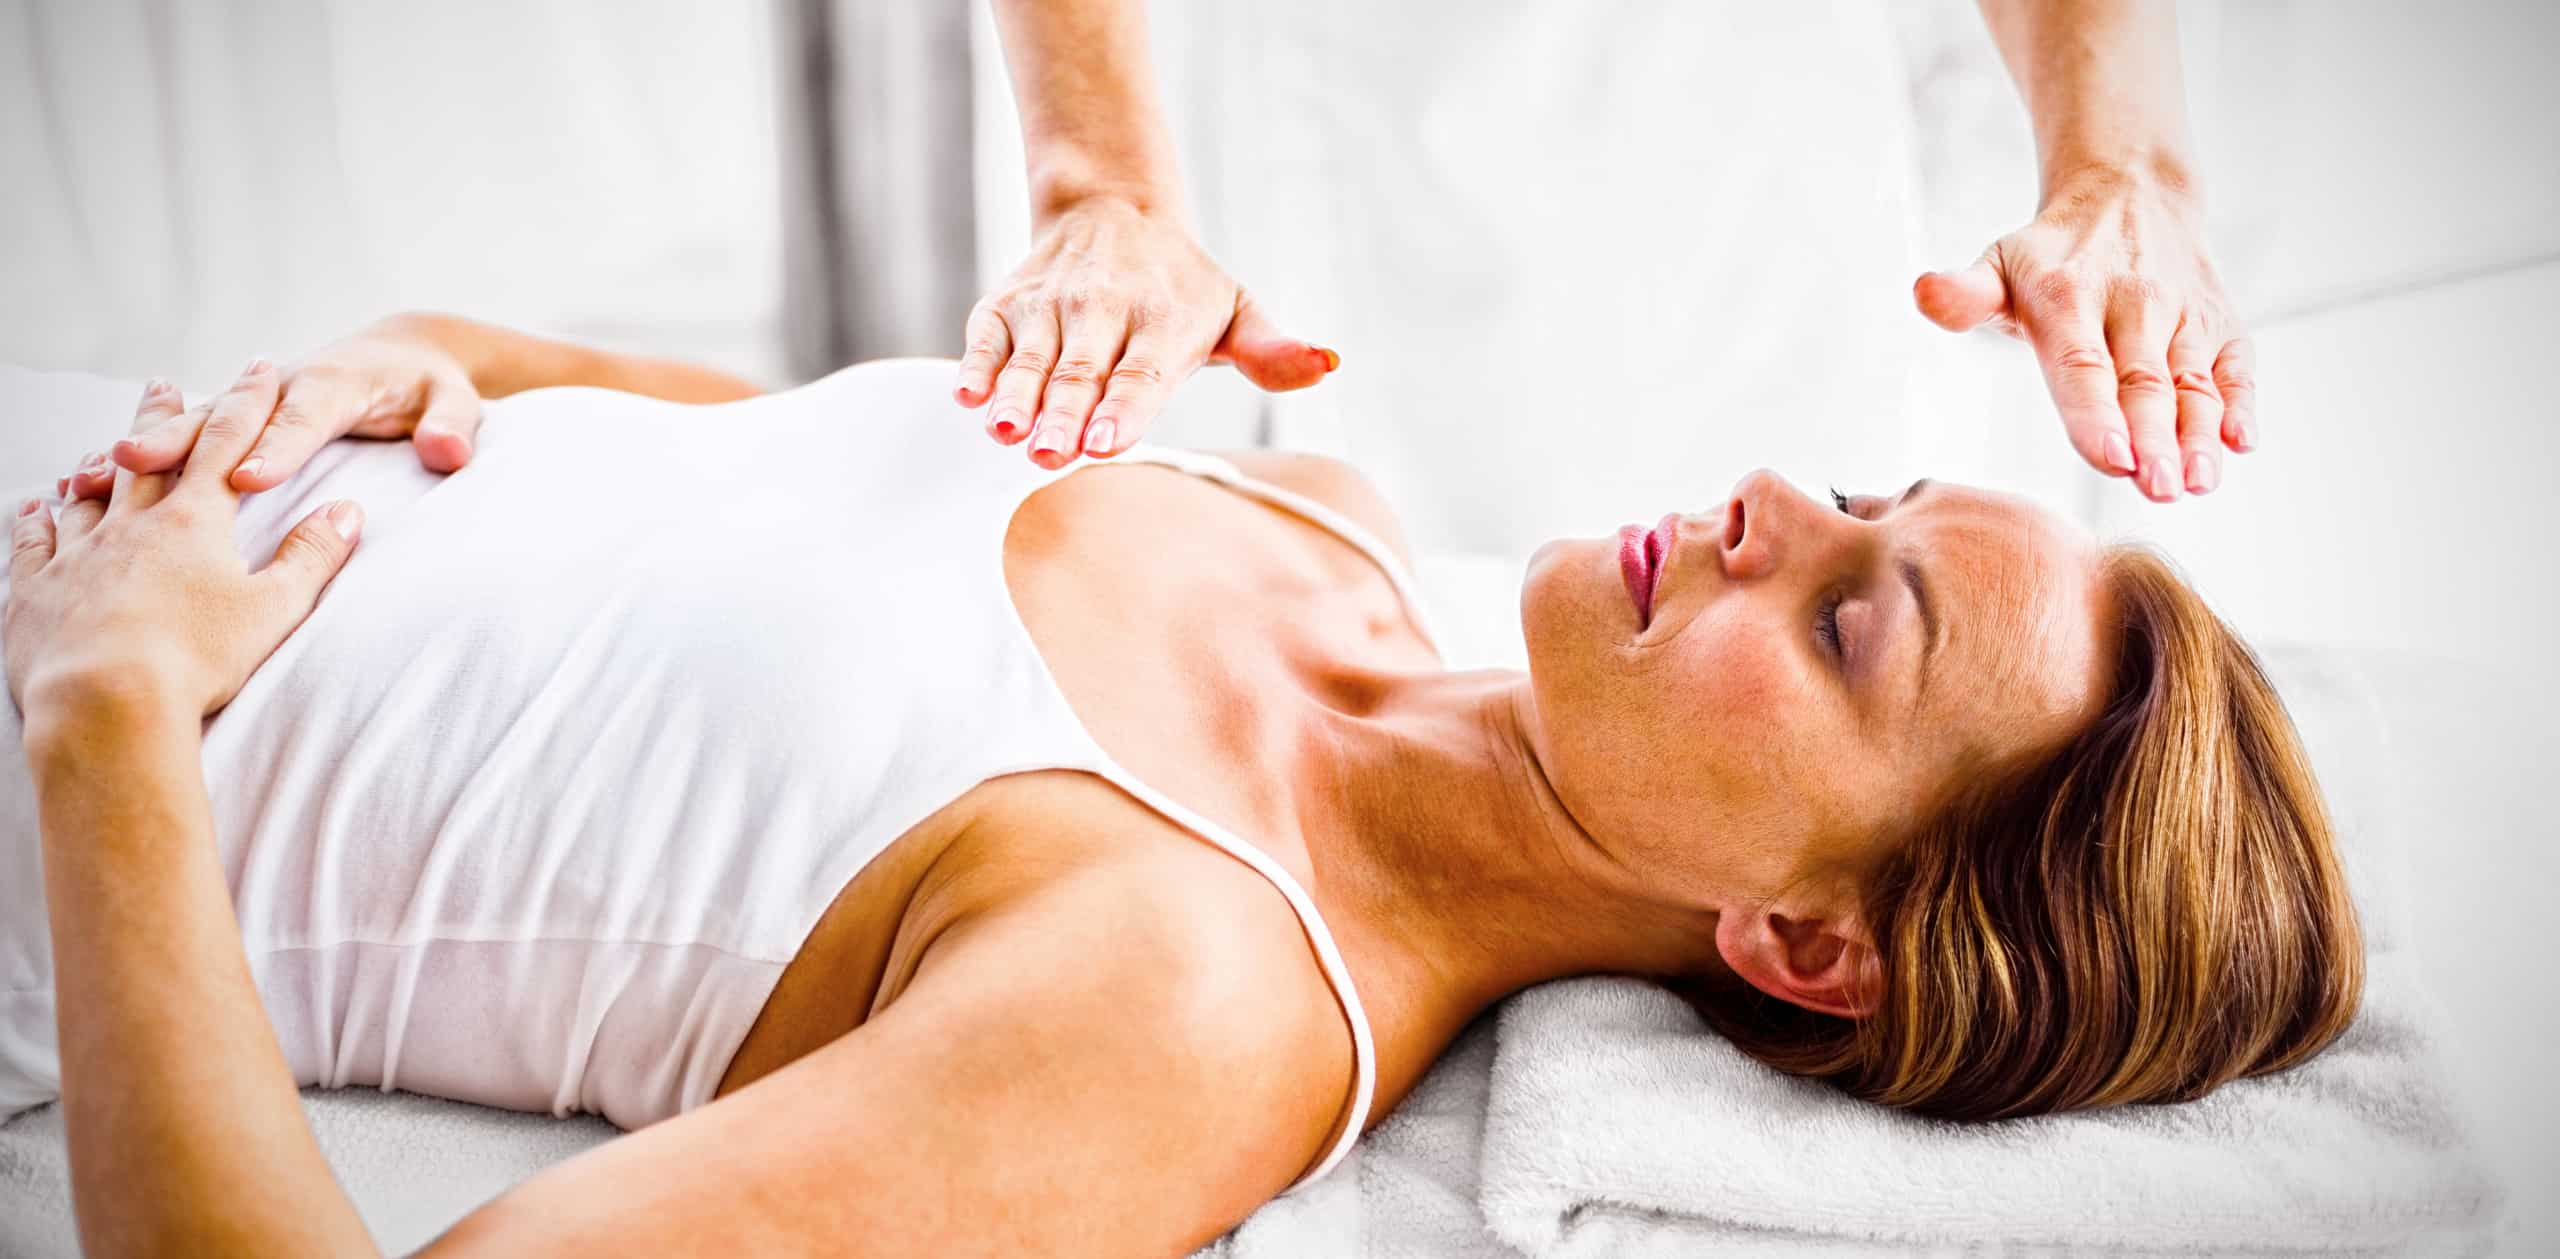 reiki treatment at spa - positive mindset - Meditation Hypnosis